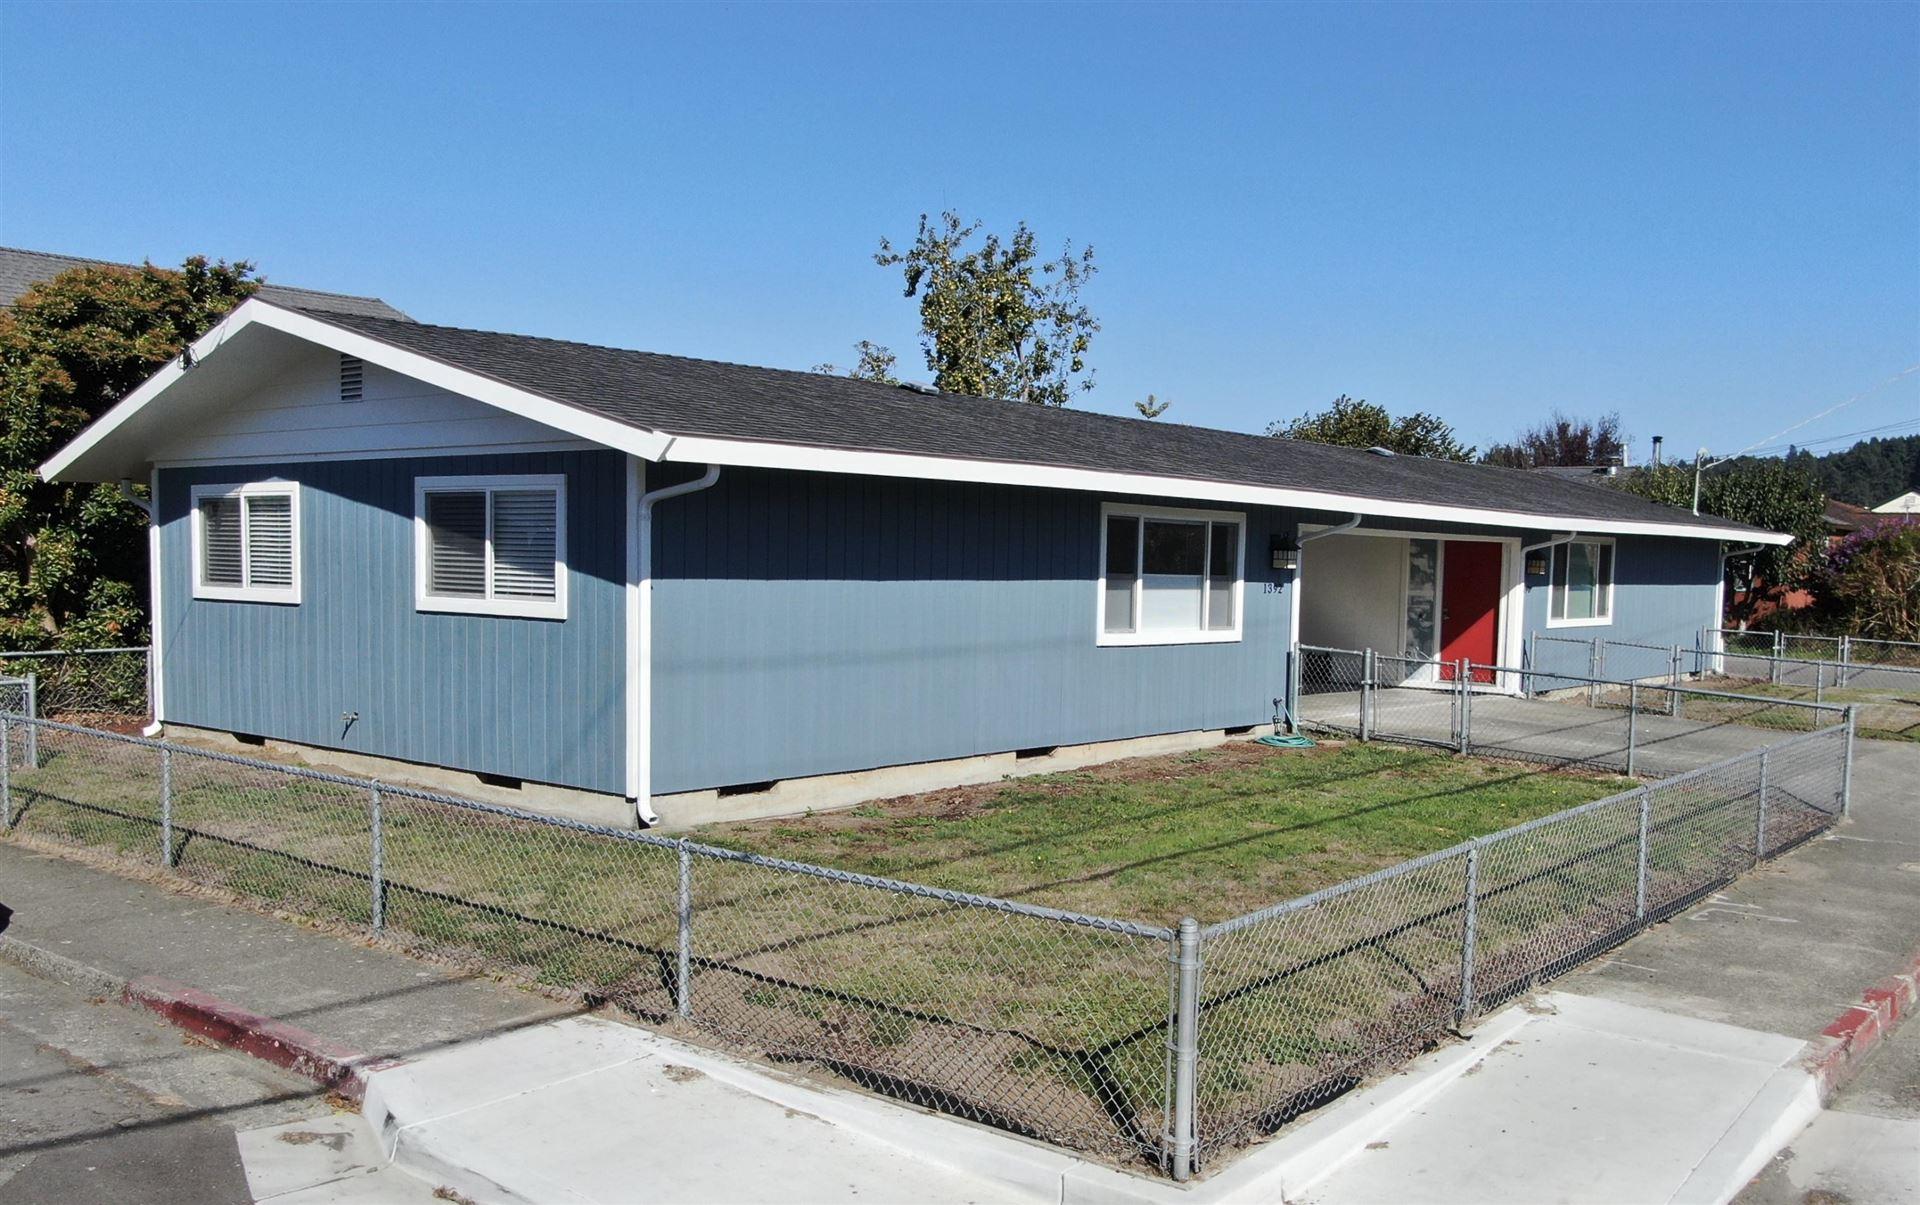 1390\/1392 Sunset Avenue, Arcata, CA 95521 - MLS#: 257606